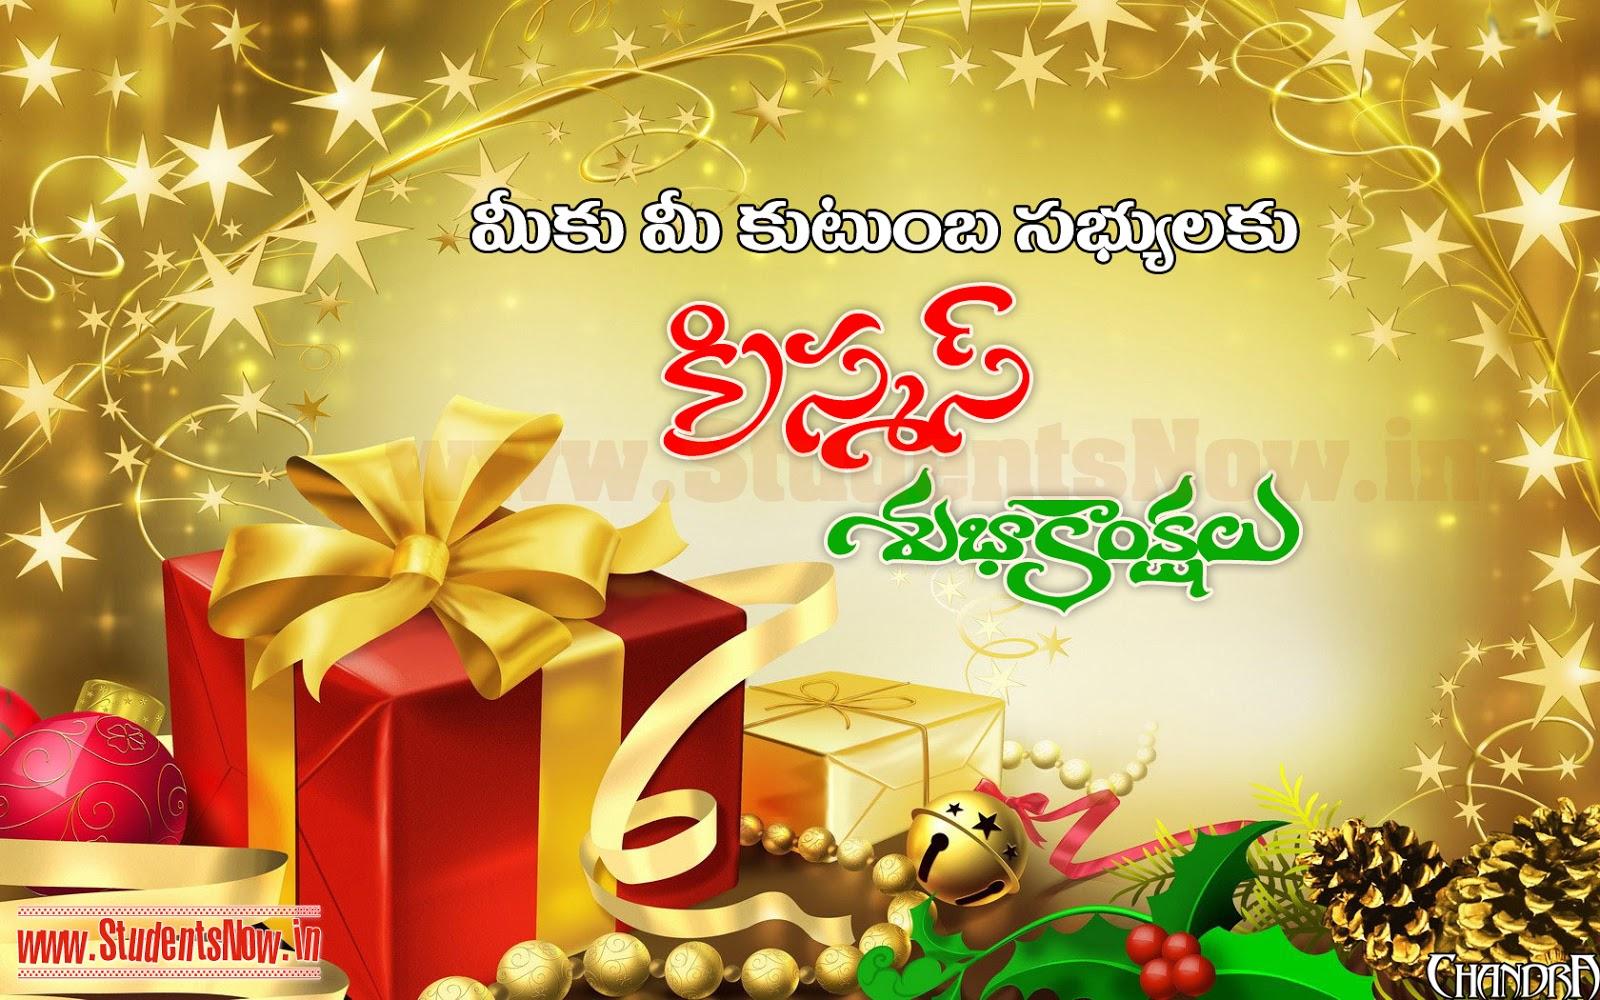 http://4.bp.blogspot.com/-ohiTx8lIMXc/UNXNkyZtEQI/AAAAAAAAQI0/-aMOMsx-Yug/s1600/Christmas+Greetings+Telugu+-+StudentsNow.n..jpg